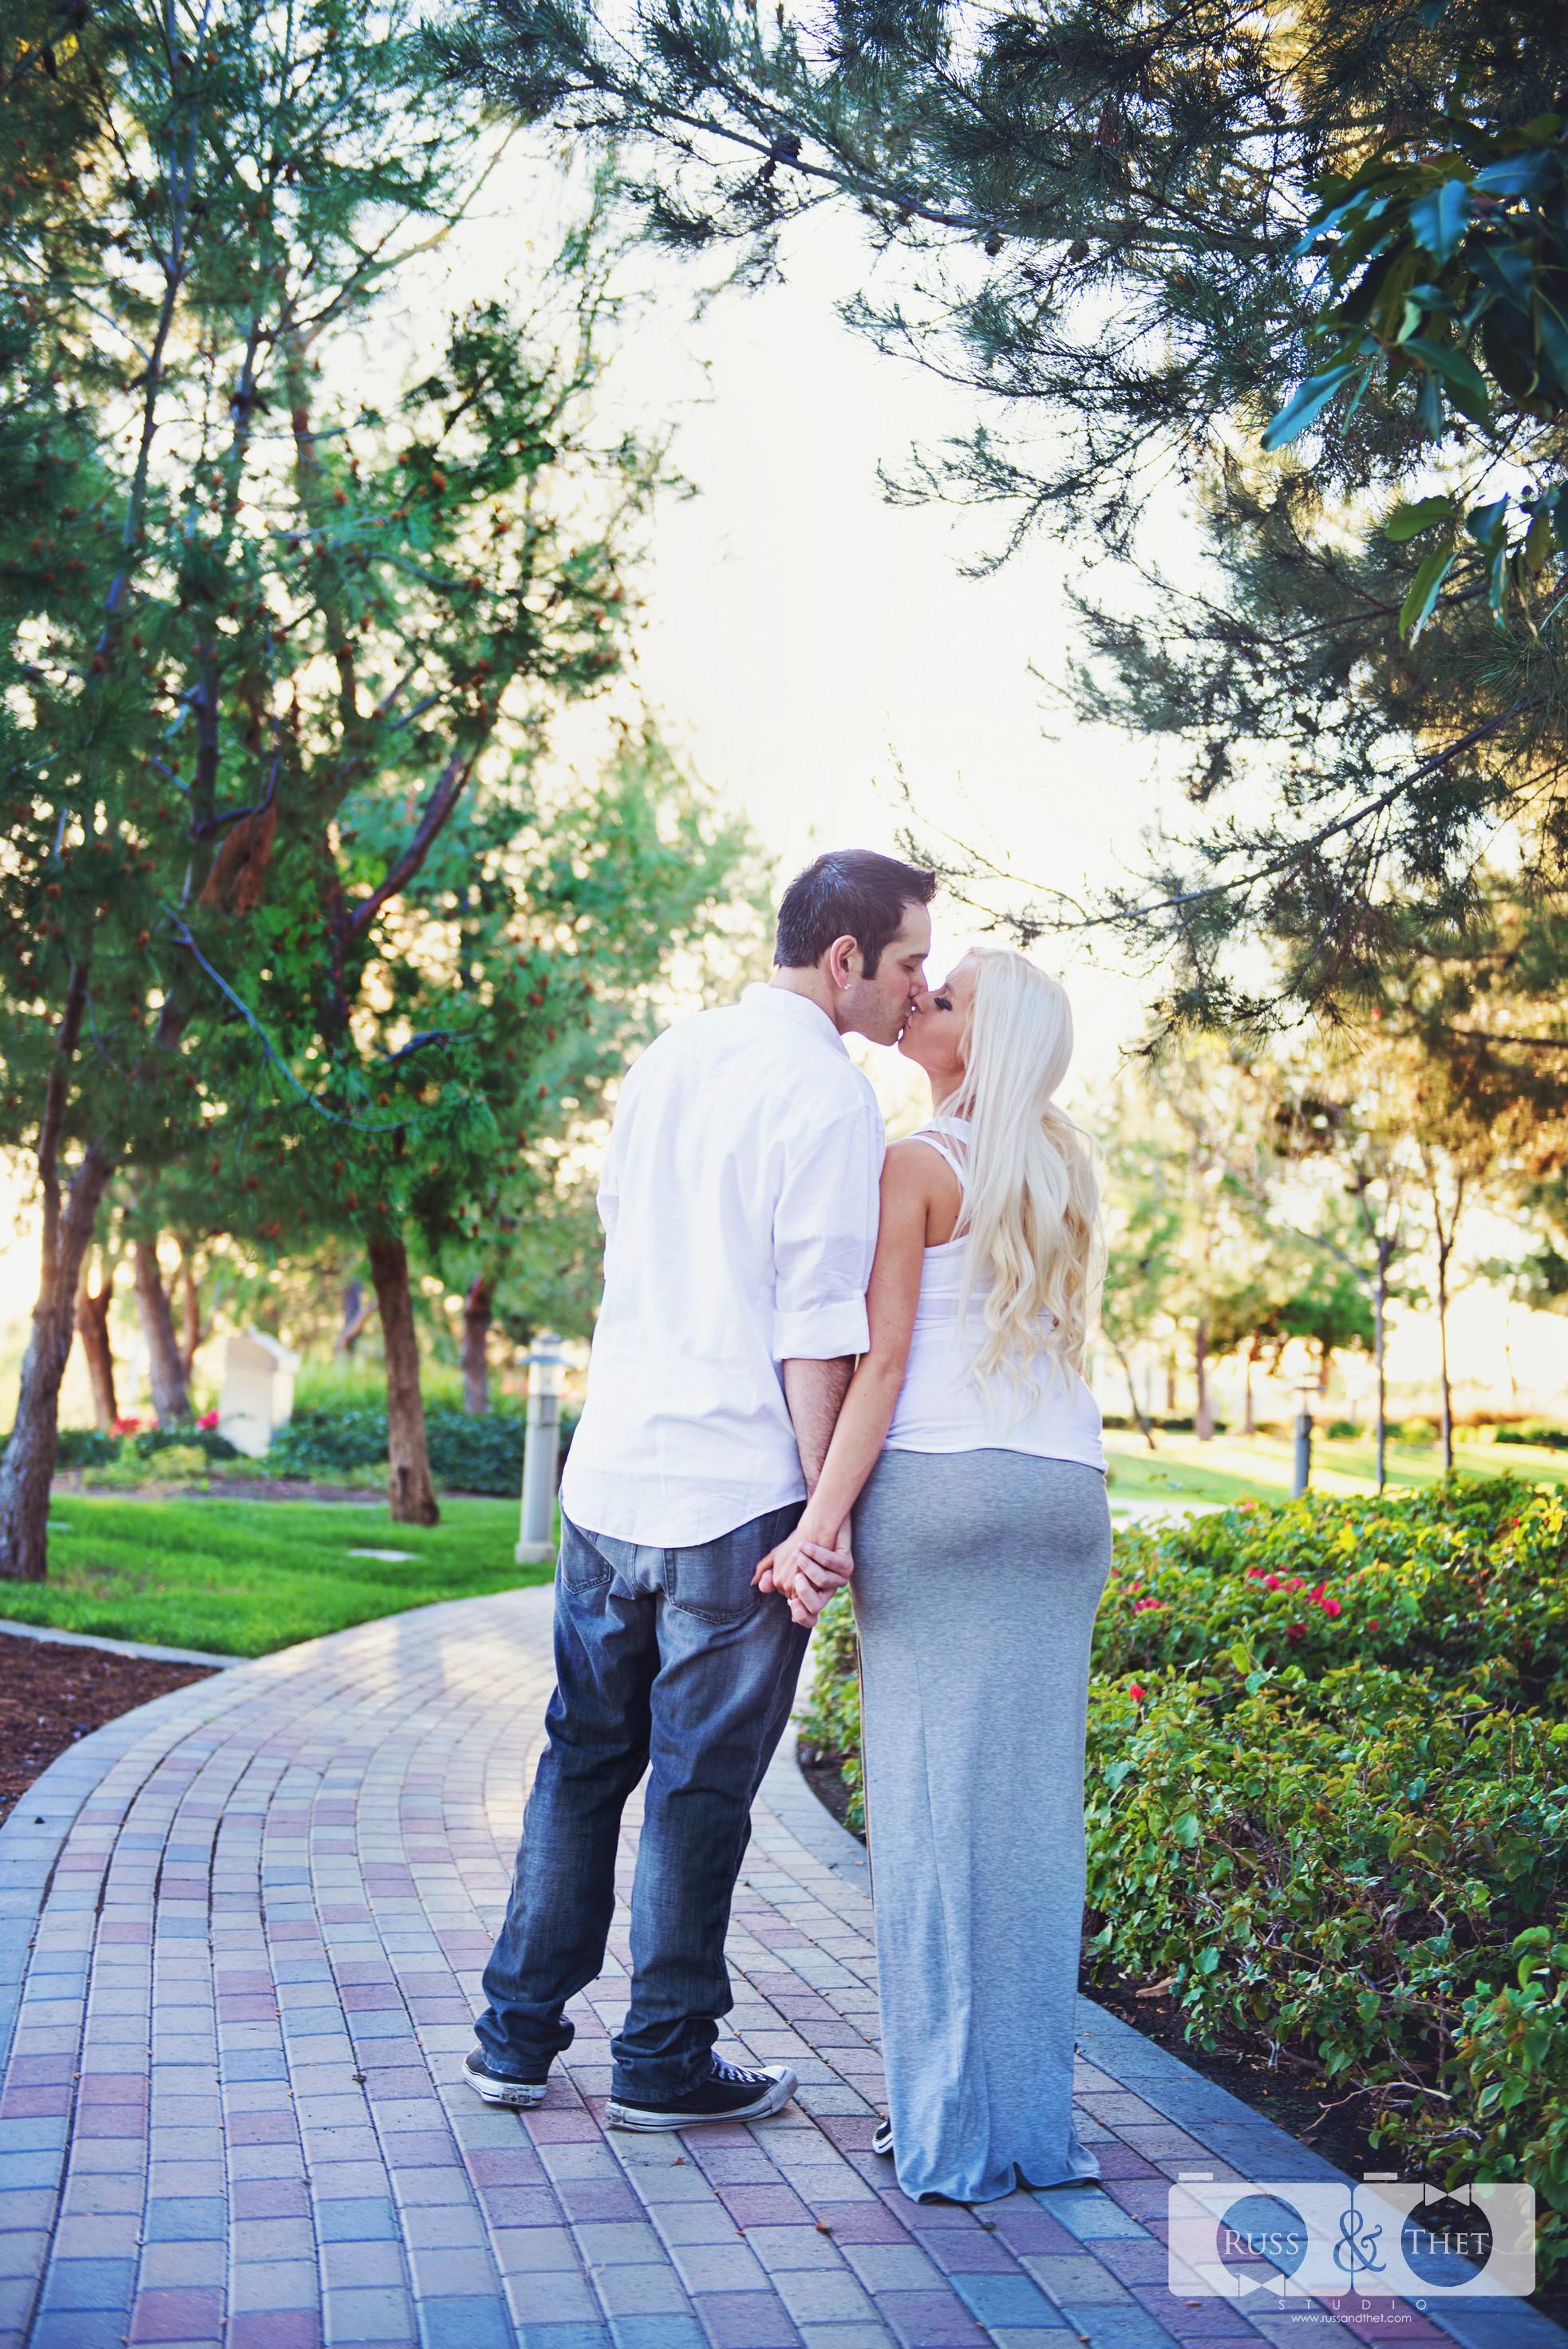 Jon&Kimee-Orange-County-Engagement-Photographer (22).jpg